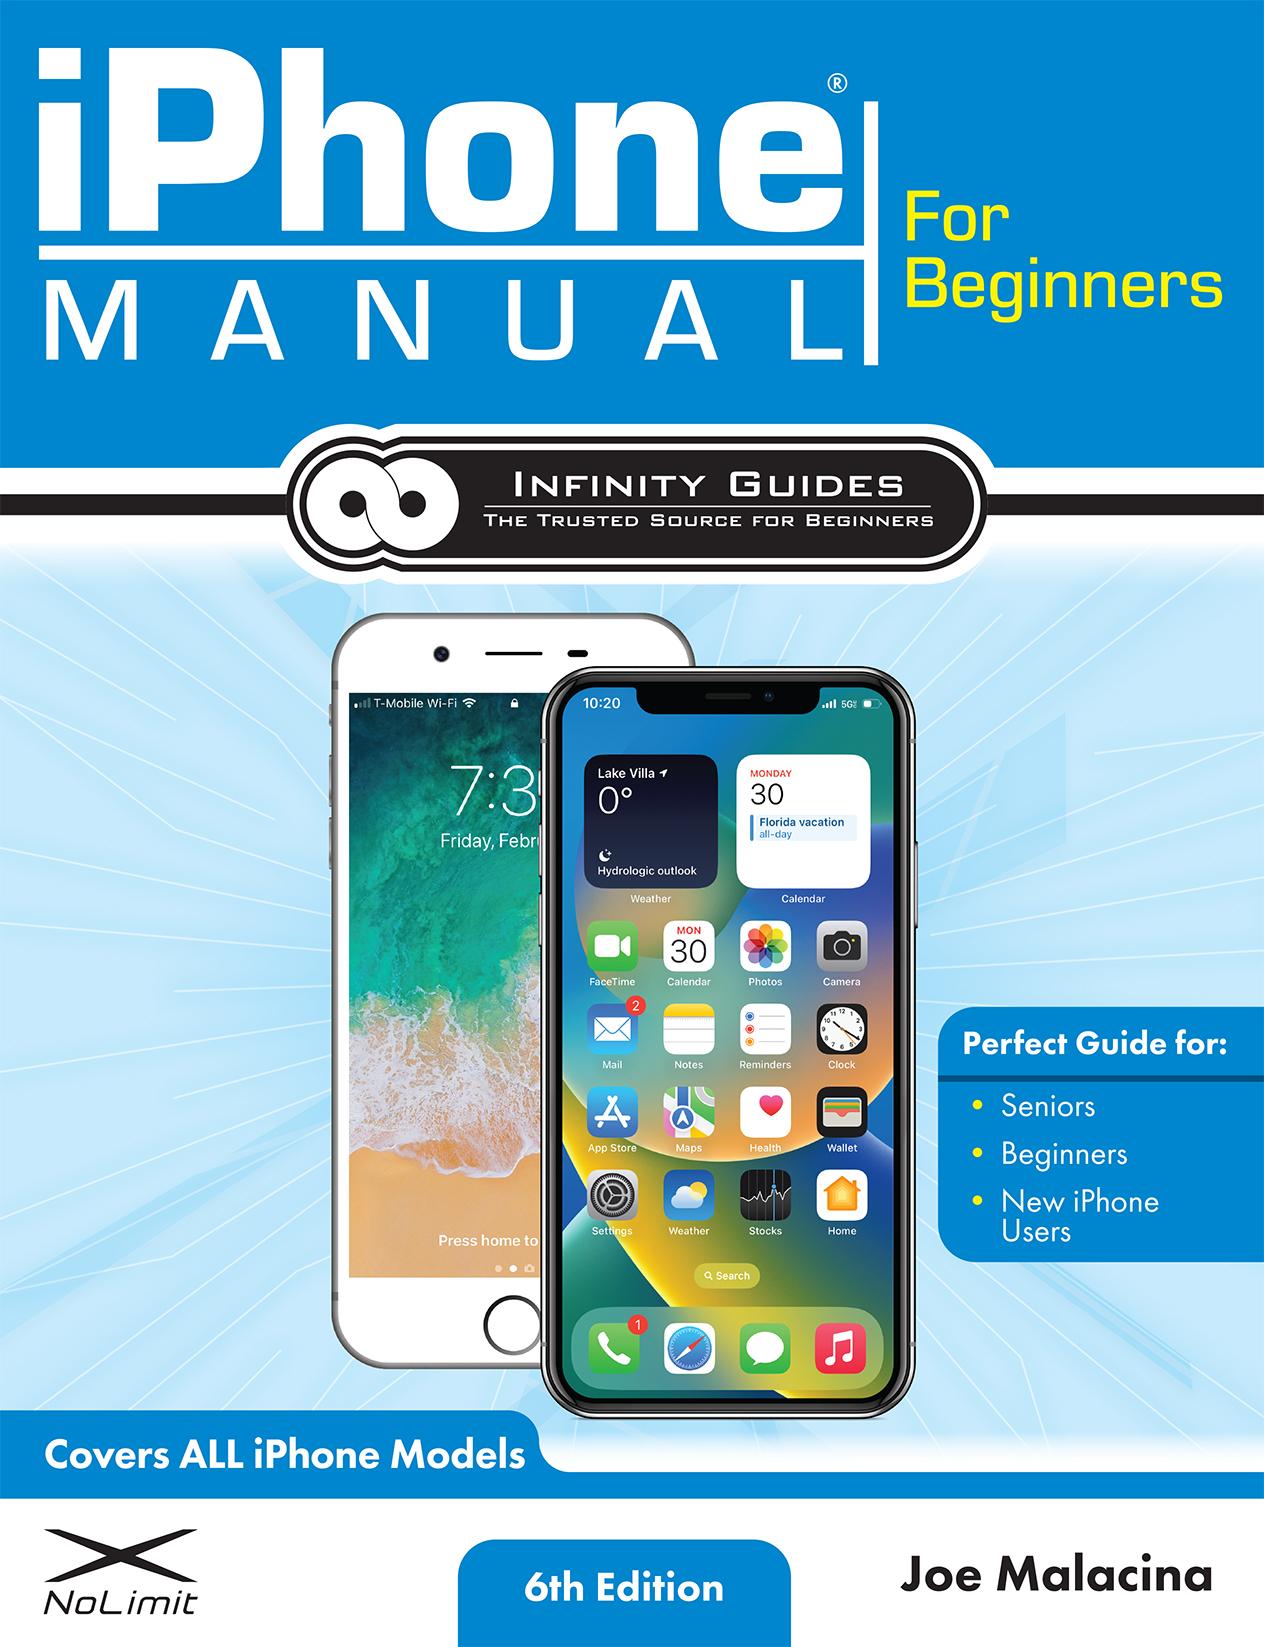 BeginnerManuals - iPhone Manual for Beginners - instructional manual